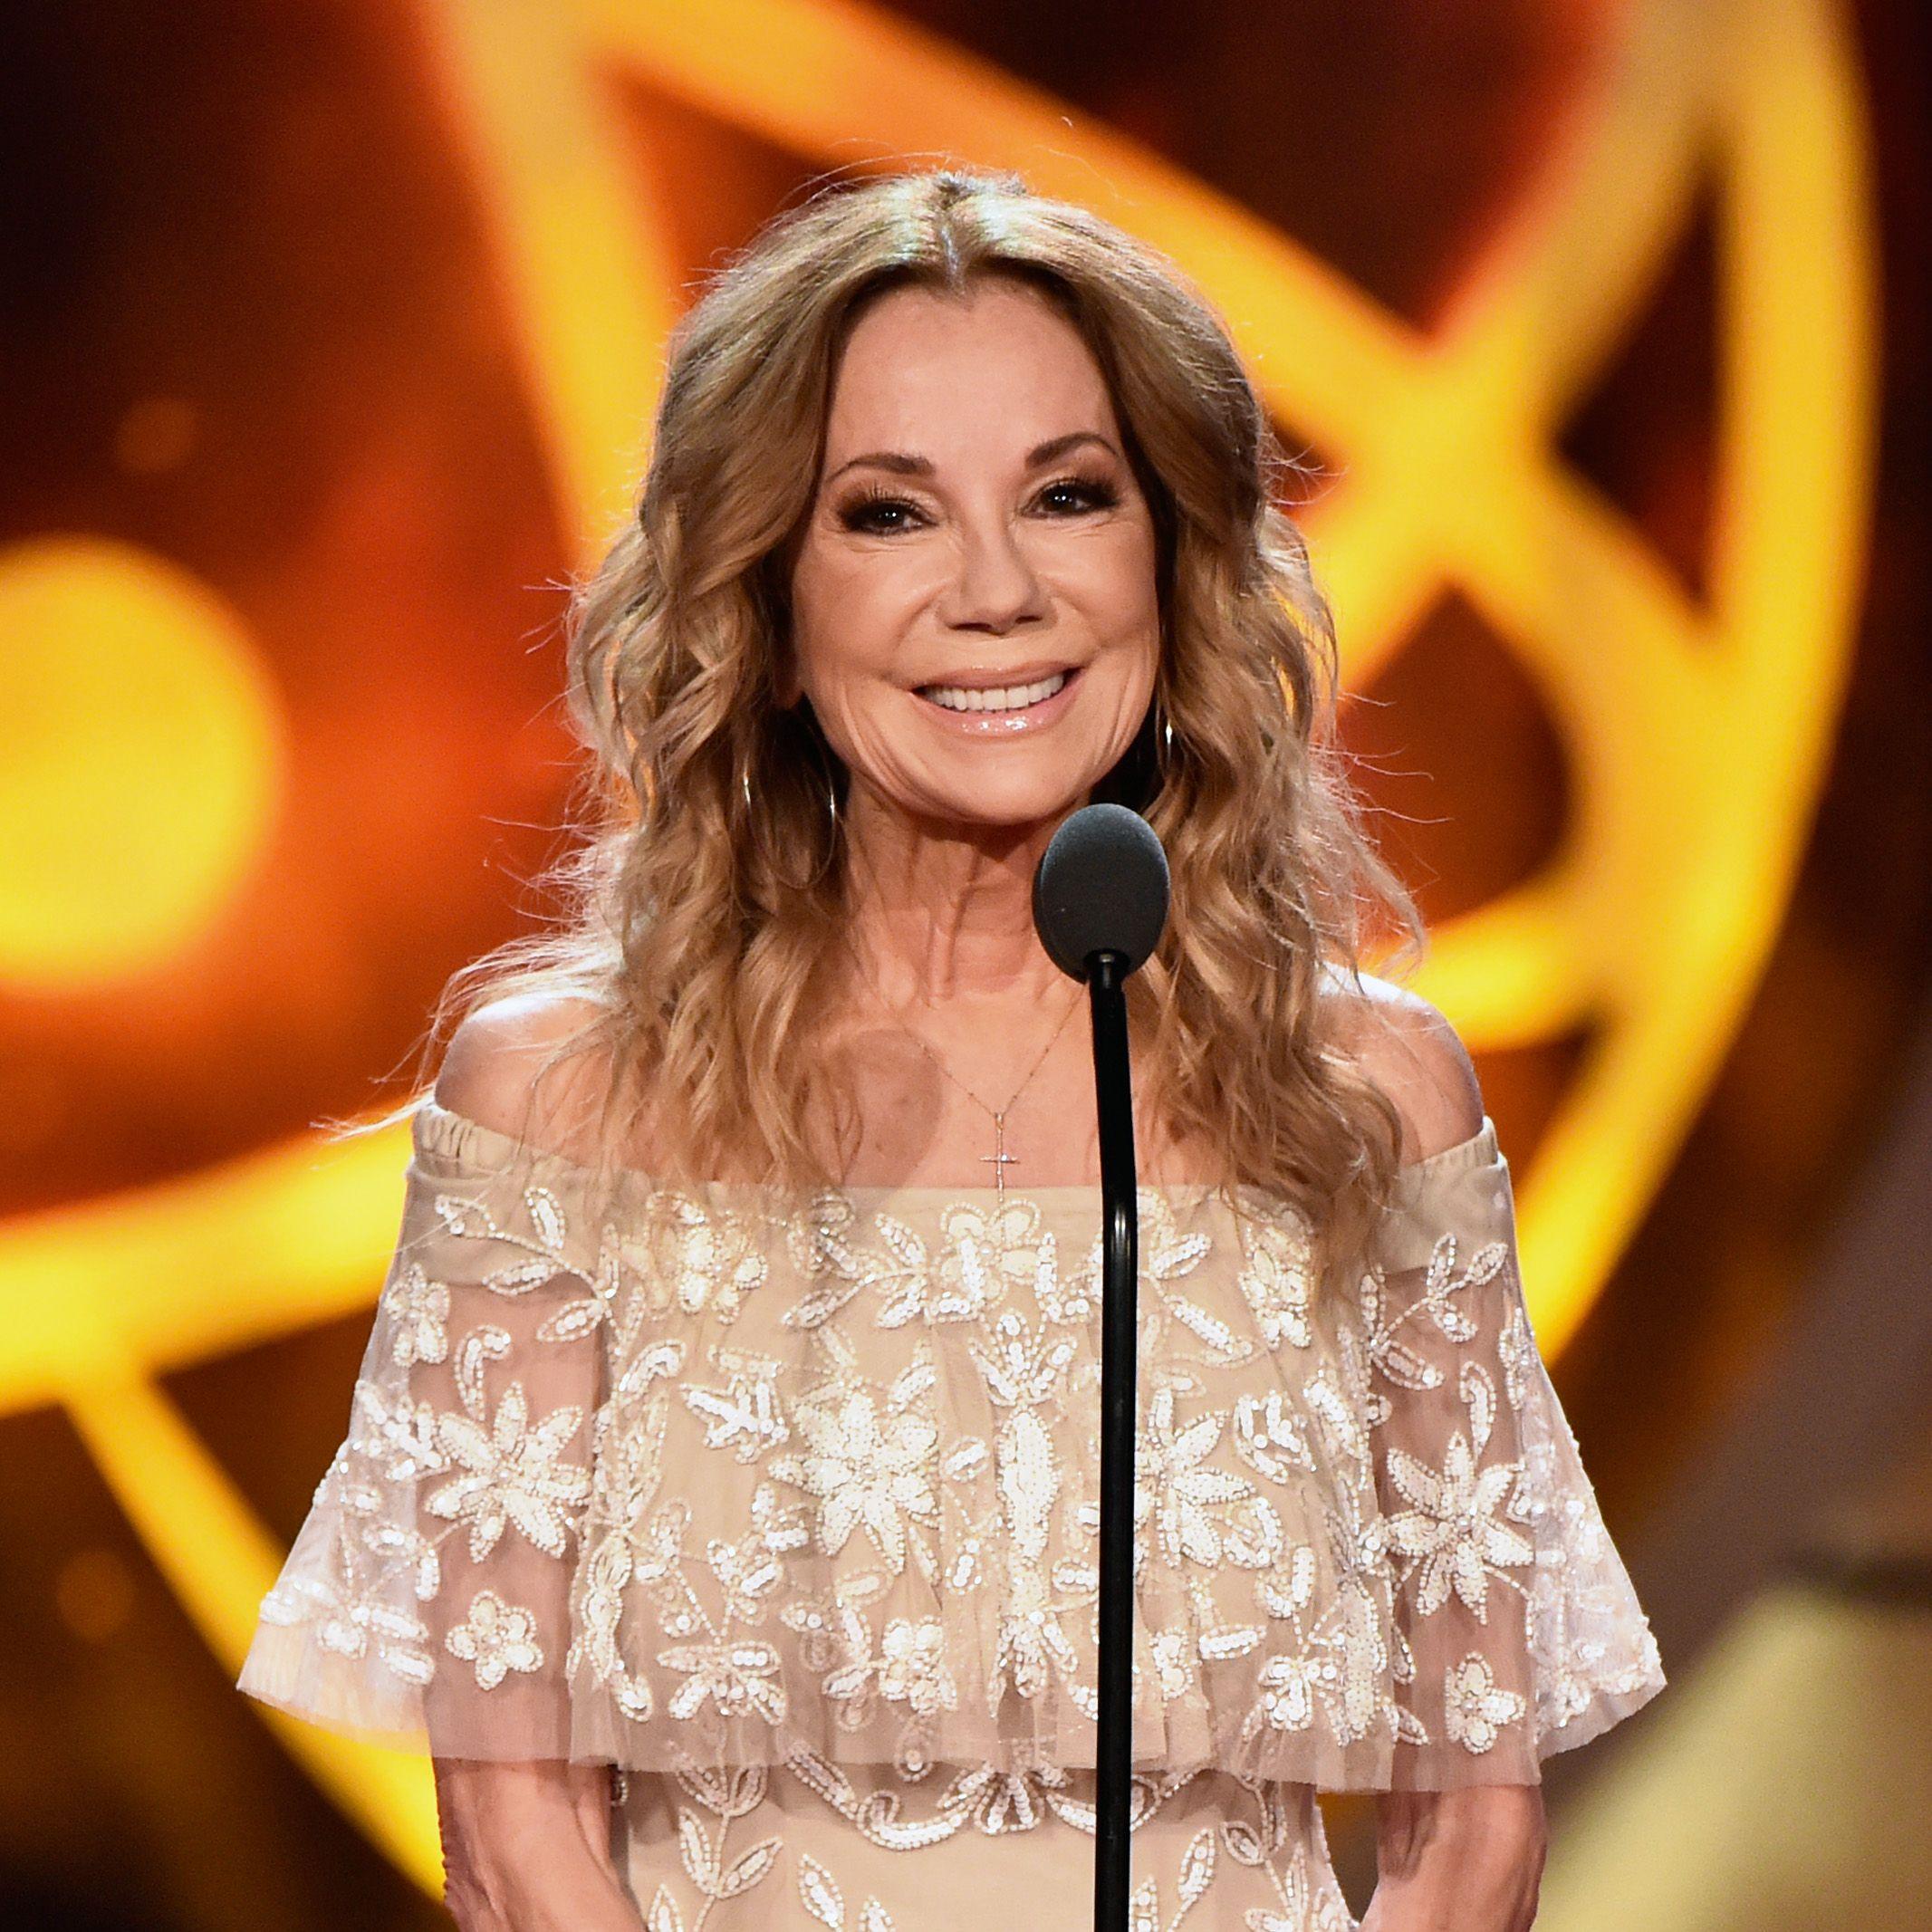 Kathie Lee Gifford and Hoda Kotb Just Won an Informative Talk Show Host Emmy